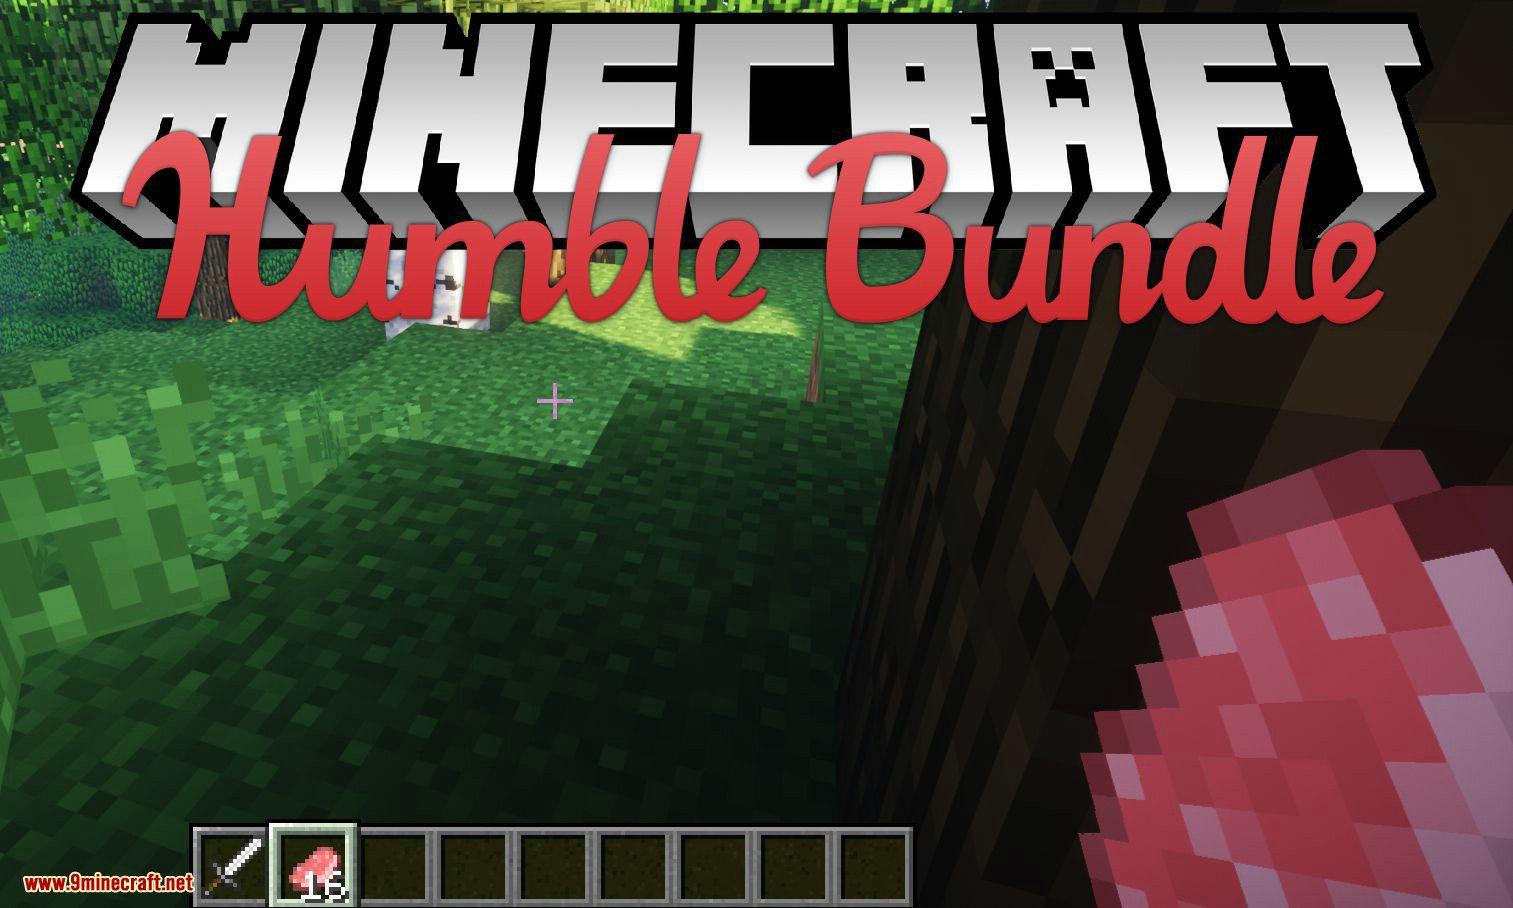 Humble Bundle mod for minecraft logo